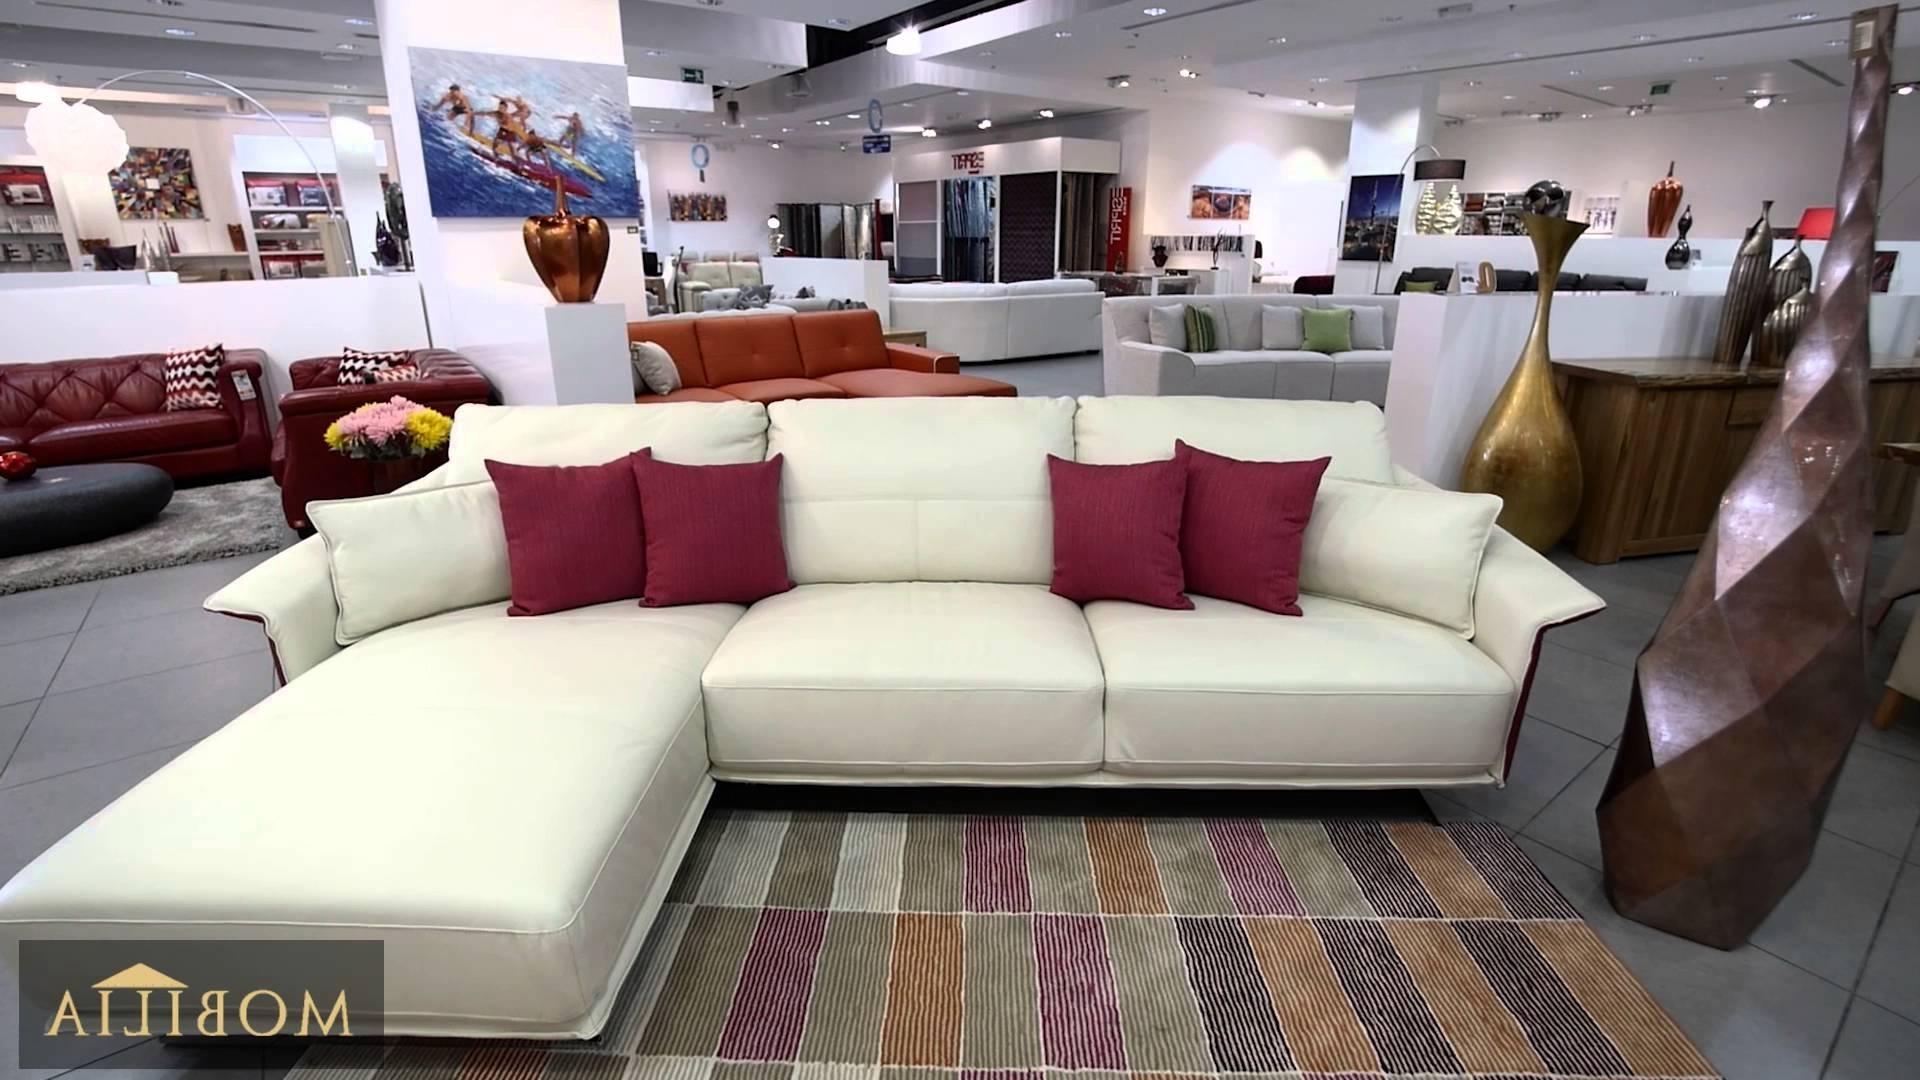 Most Recent Mobilia Furniture Dubai Sofa – Youtube With Regard To Mobilia Sectional Sofas (View 6 of 20)